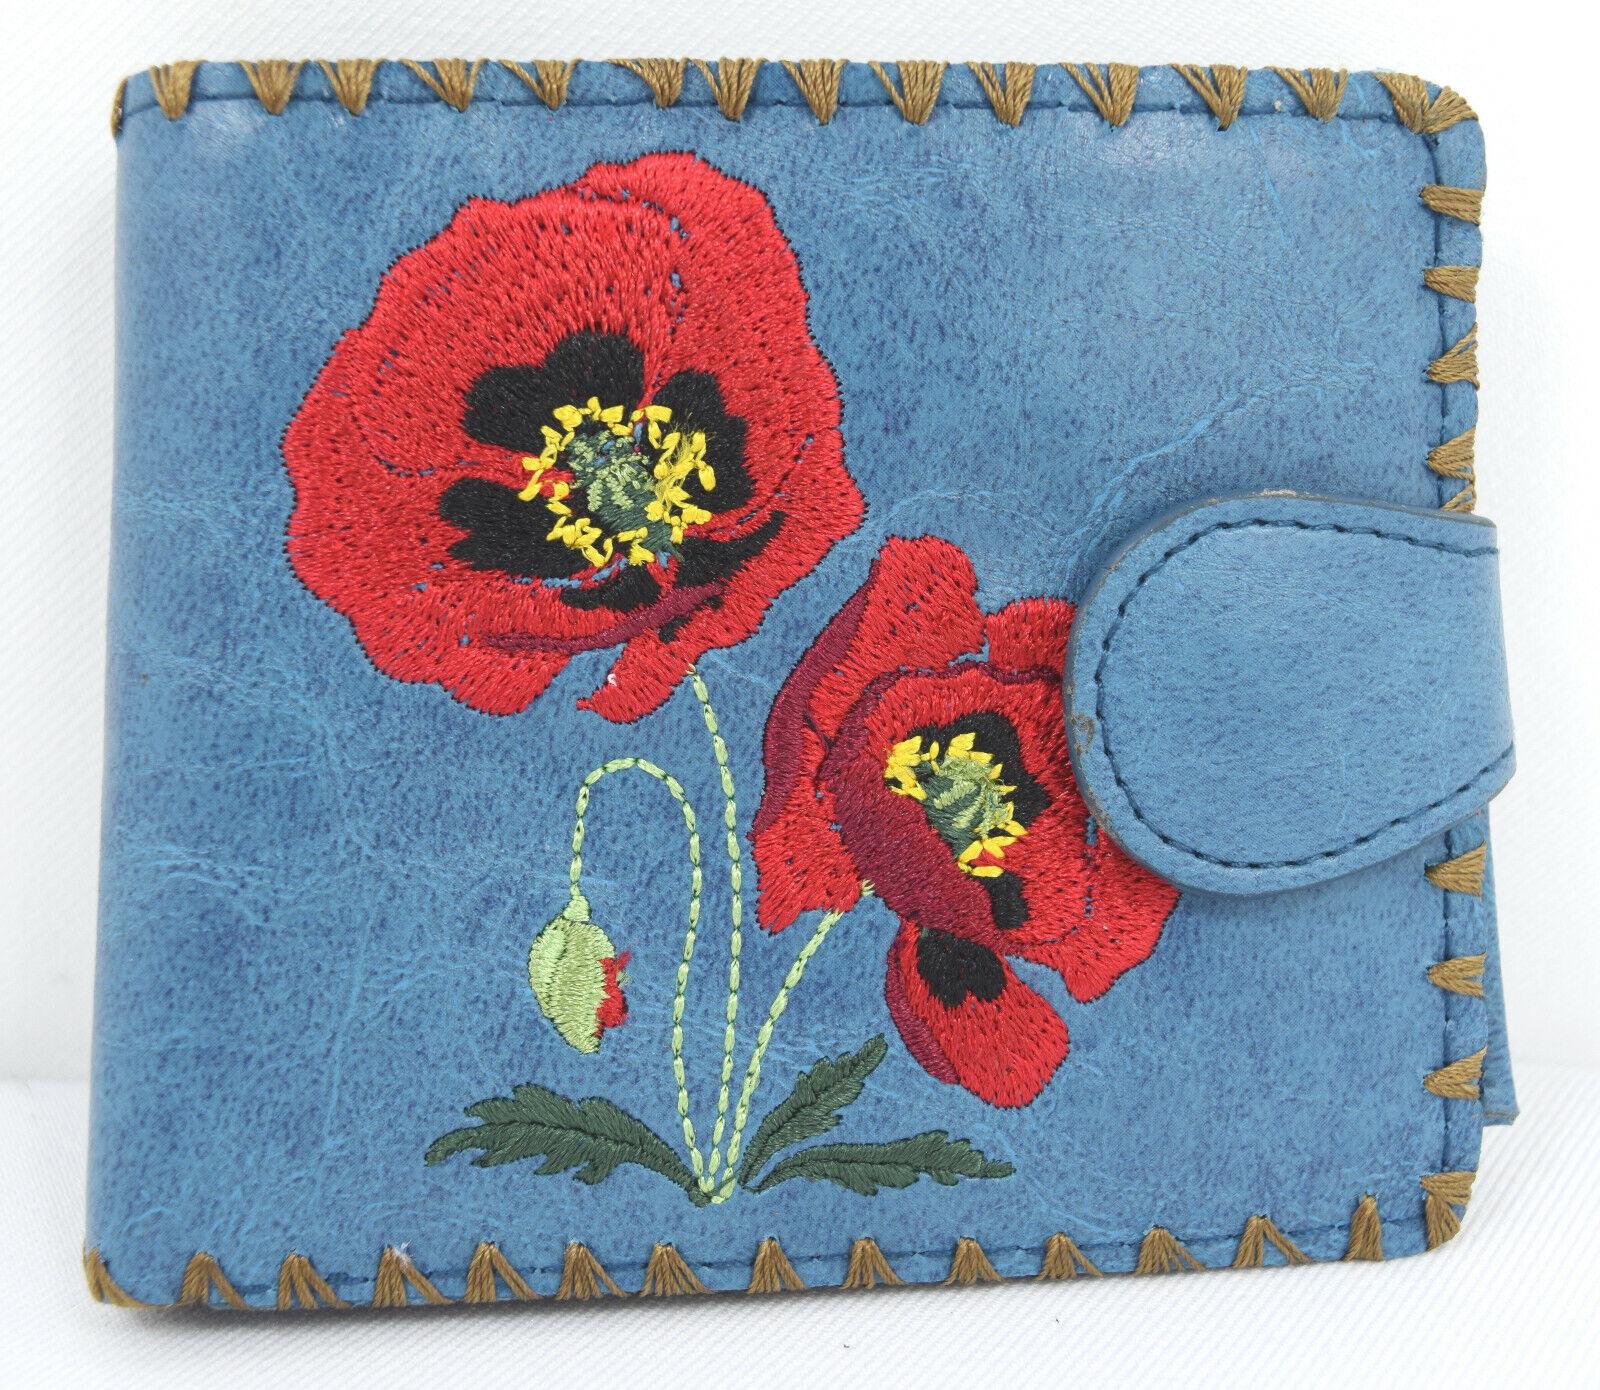 Lavishy Red Poppy Flower Embroidered Medium Bi-Fold wallet with gift box